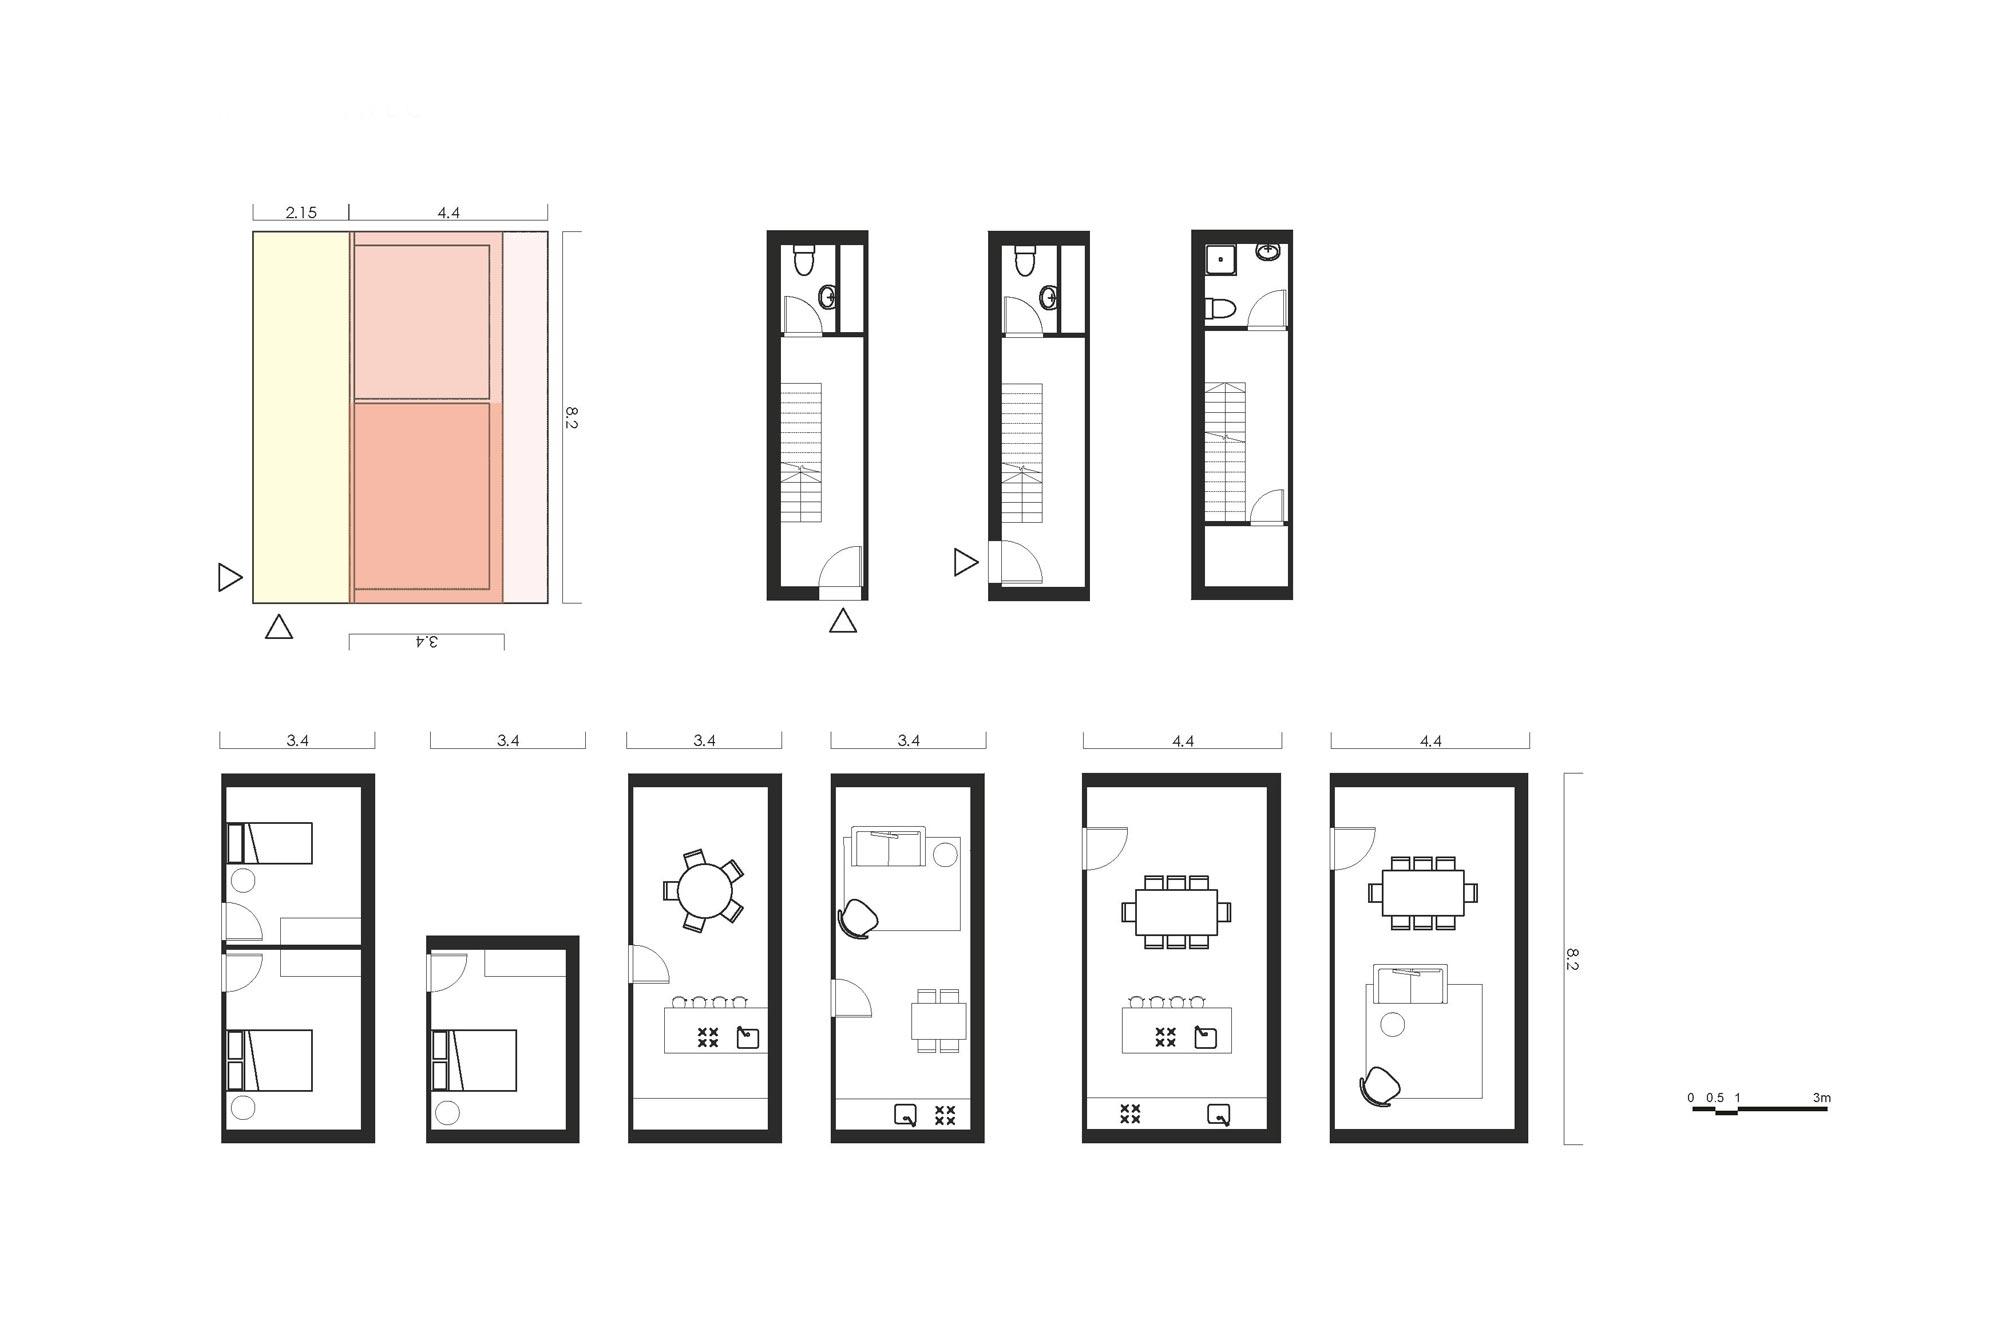 cube-haus-adjaye-associates-architects-cs-2000px-11